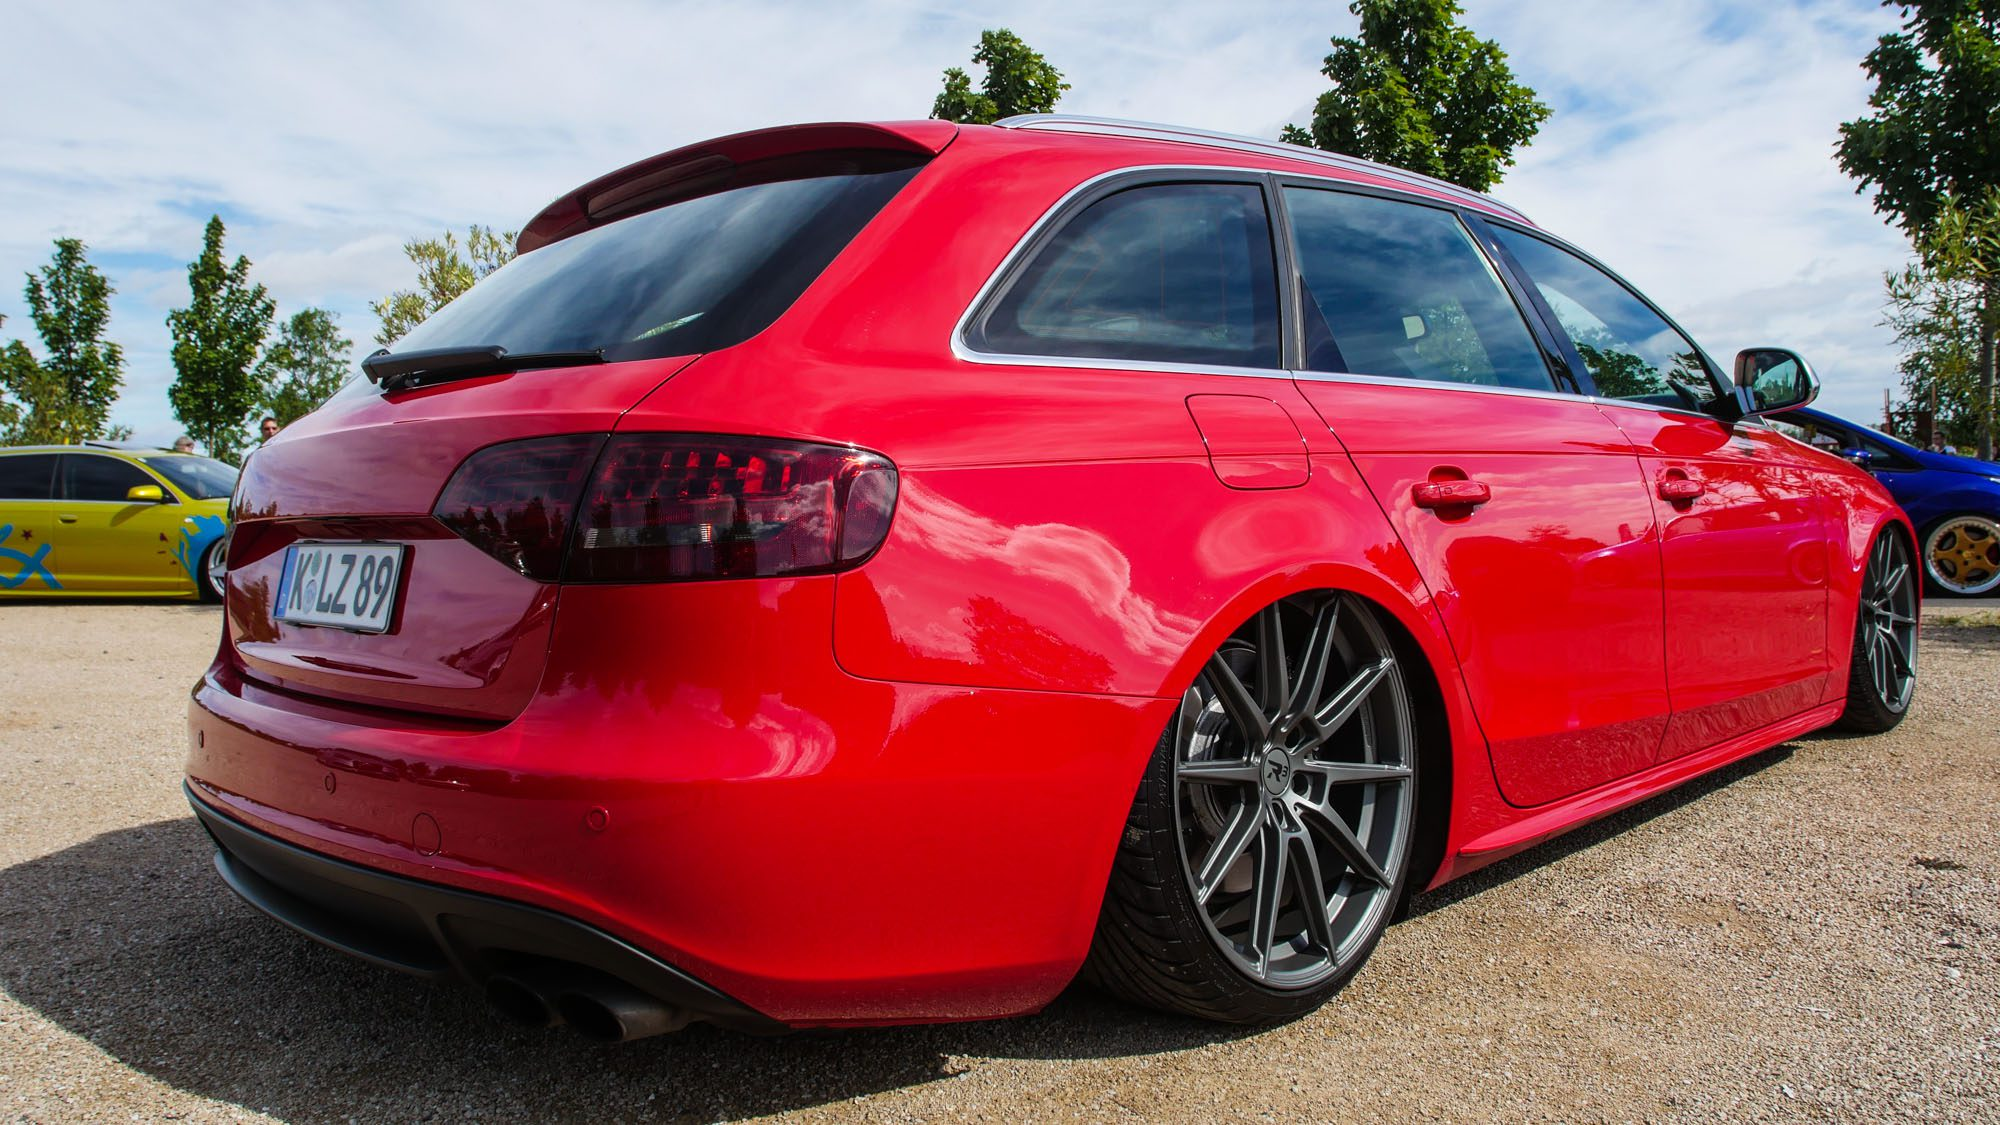 Heckansicht des Audi S4 Avant